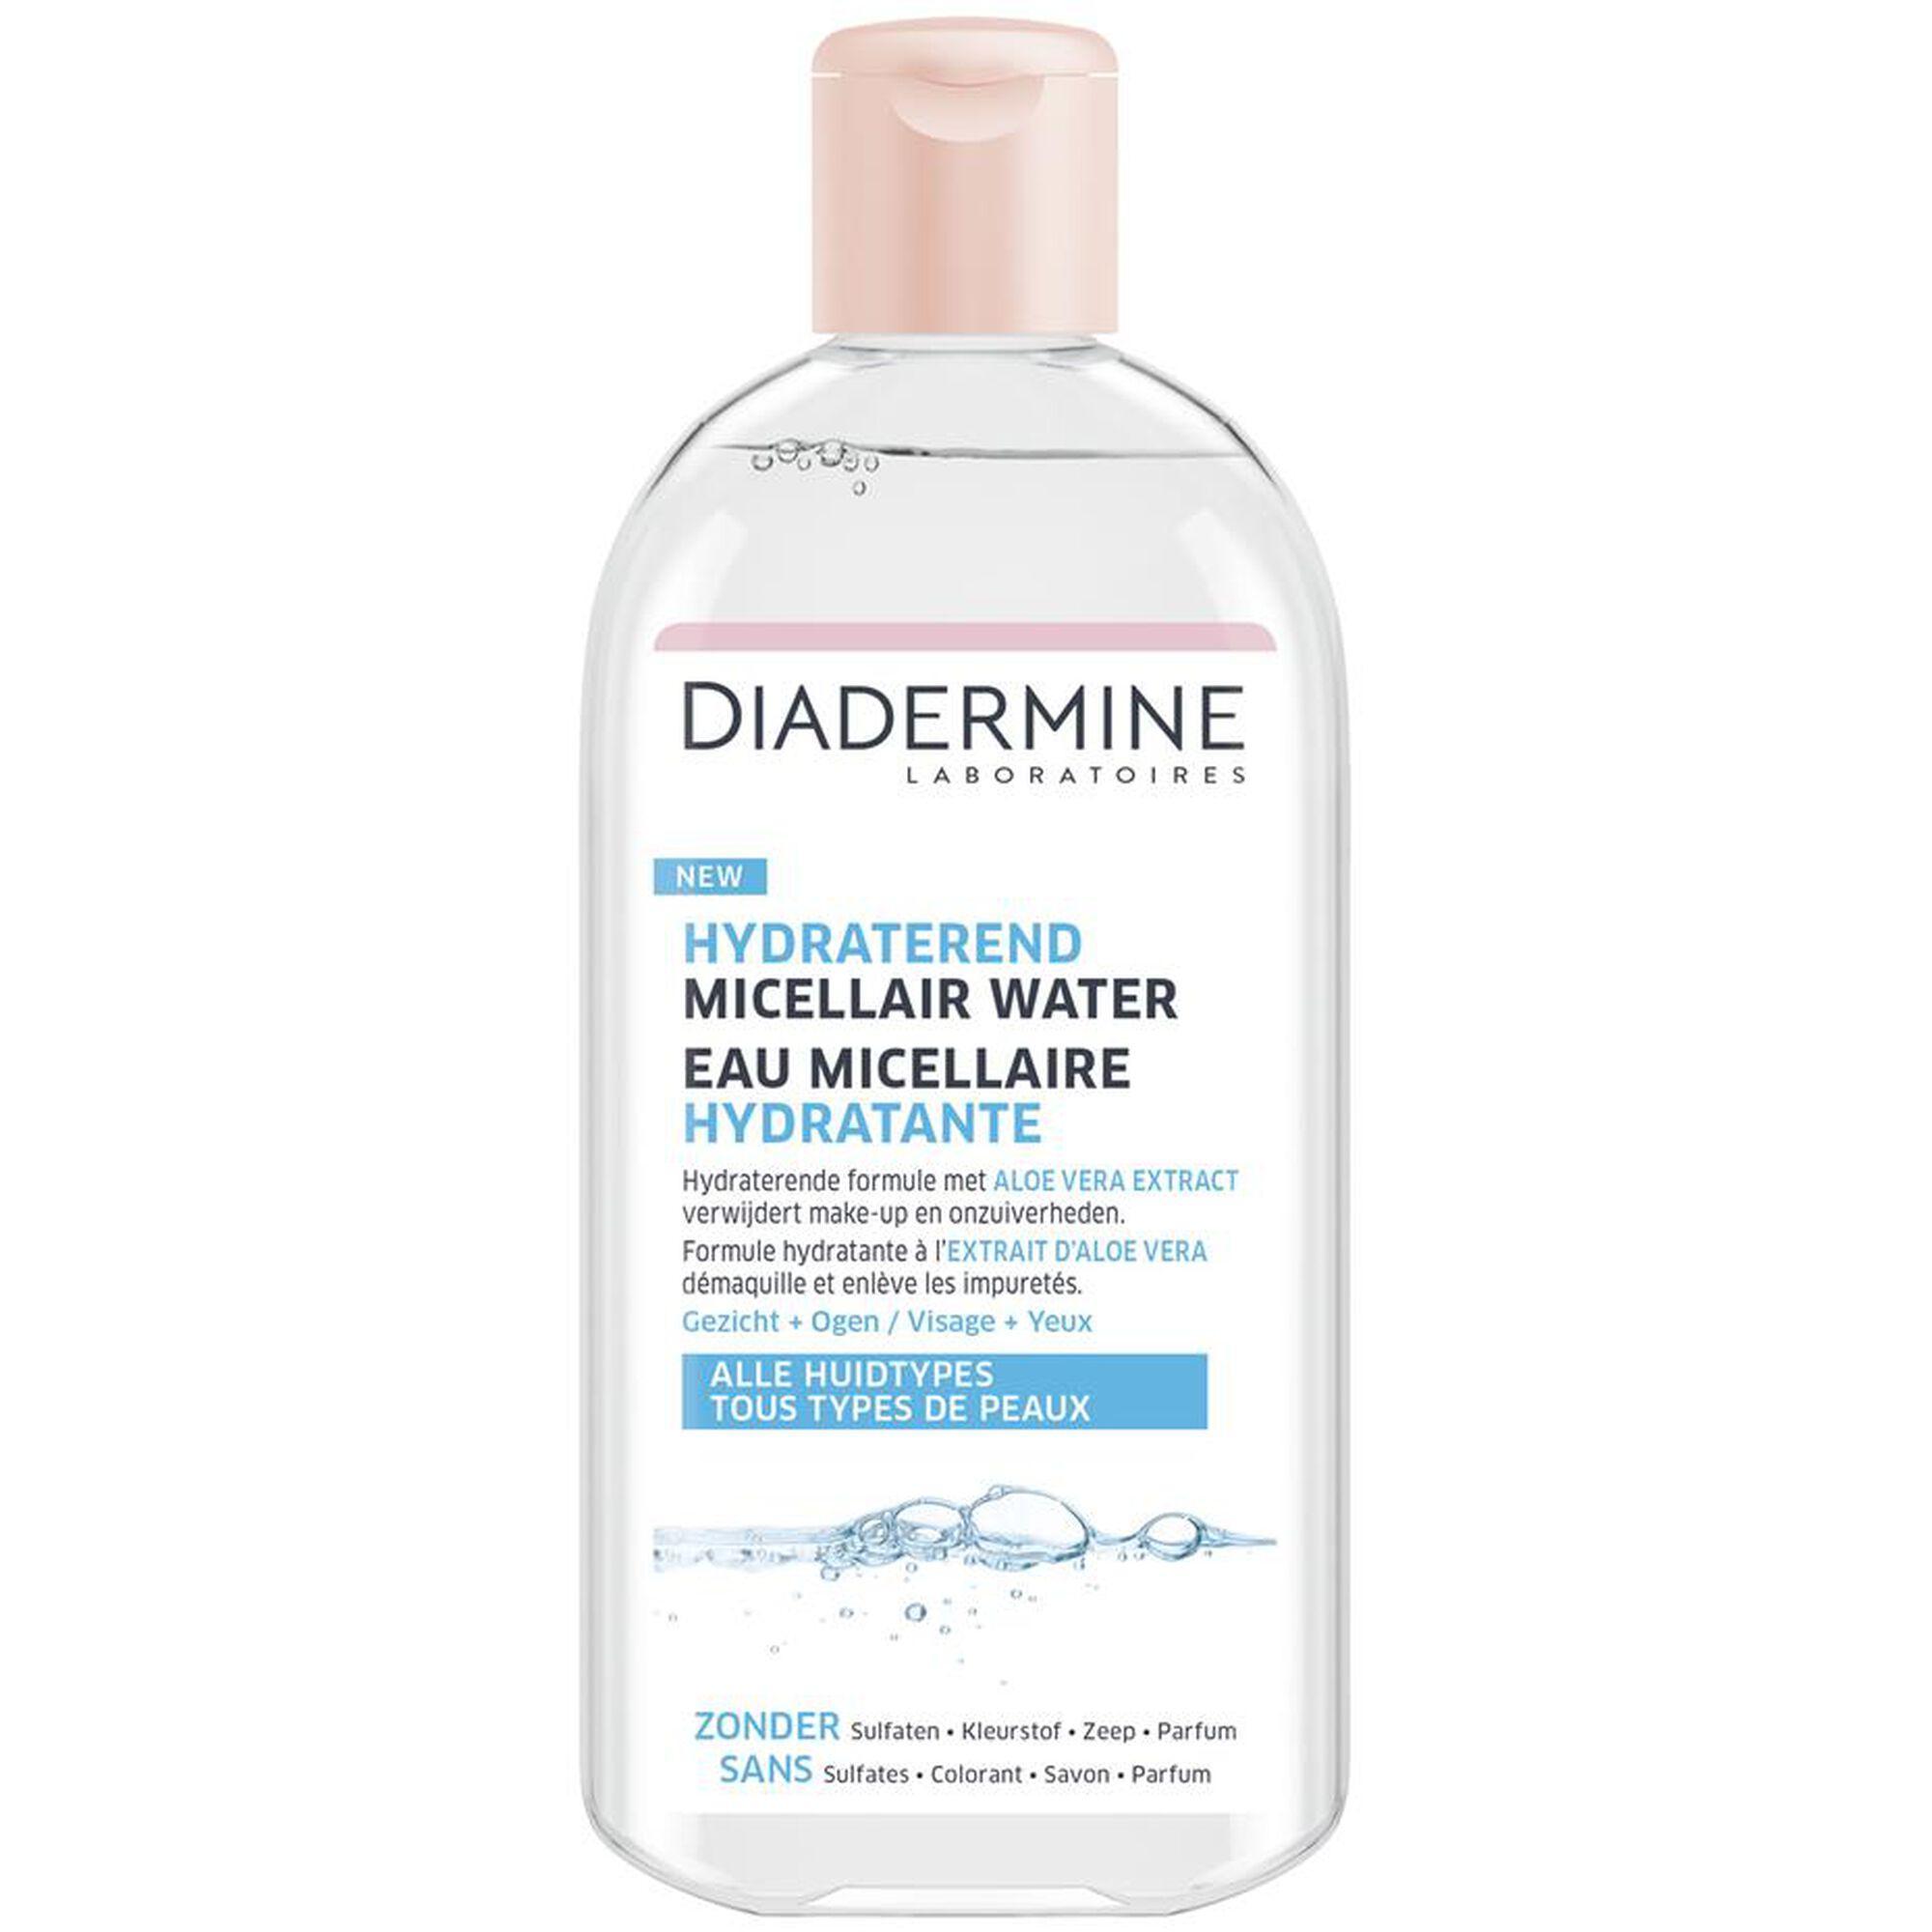 Hydraterend micellair water voor alle huidtypes (400 ml)